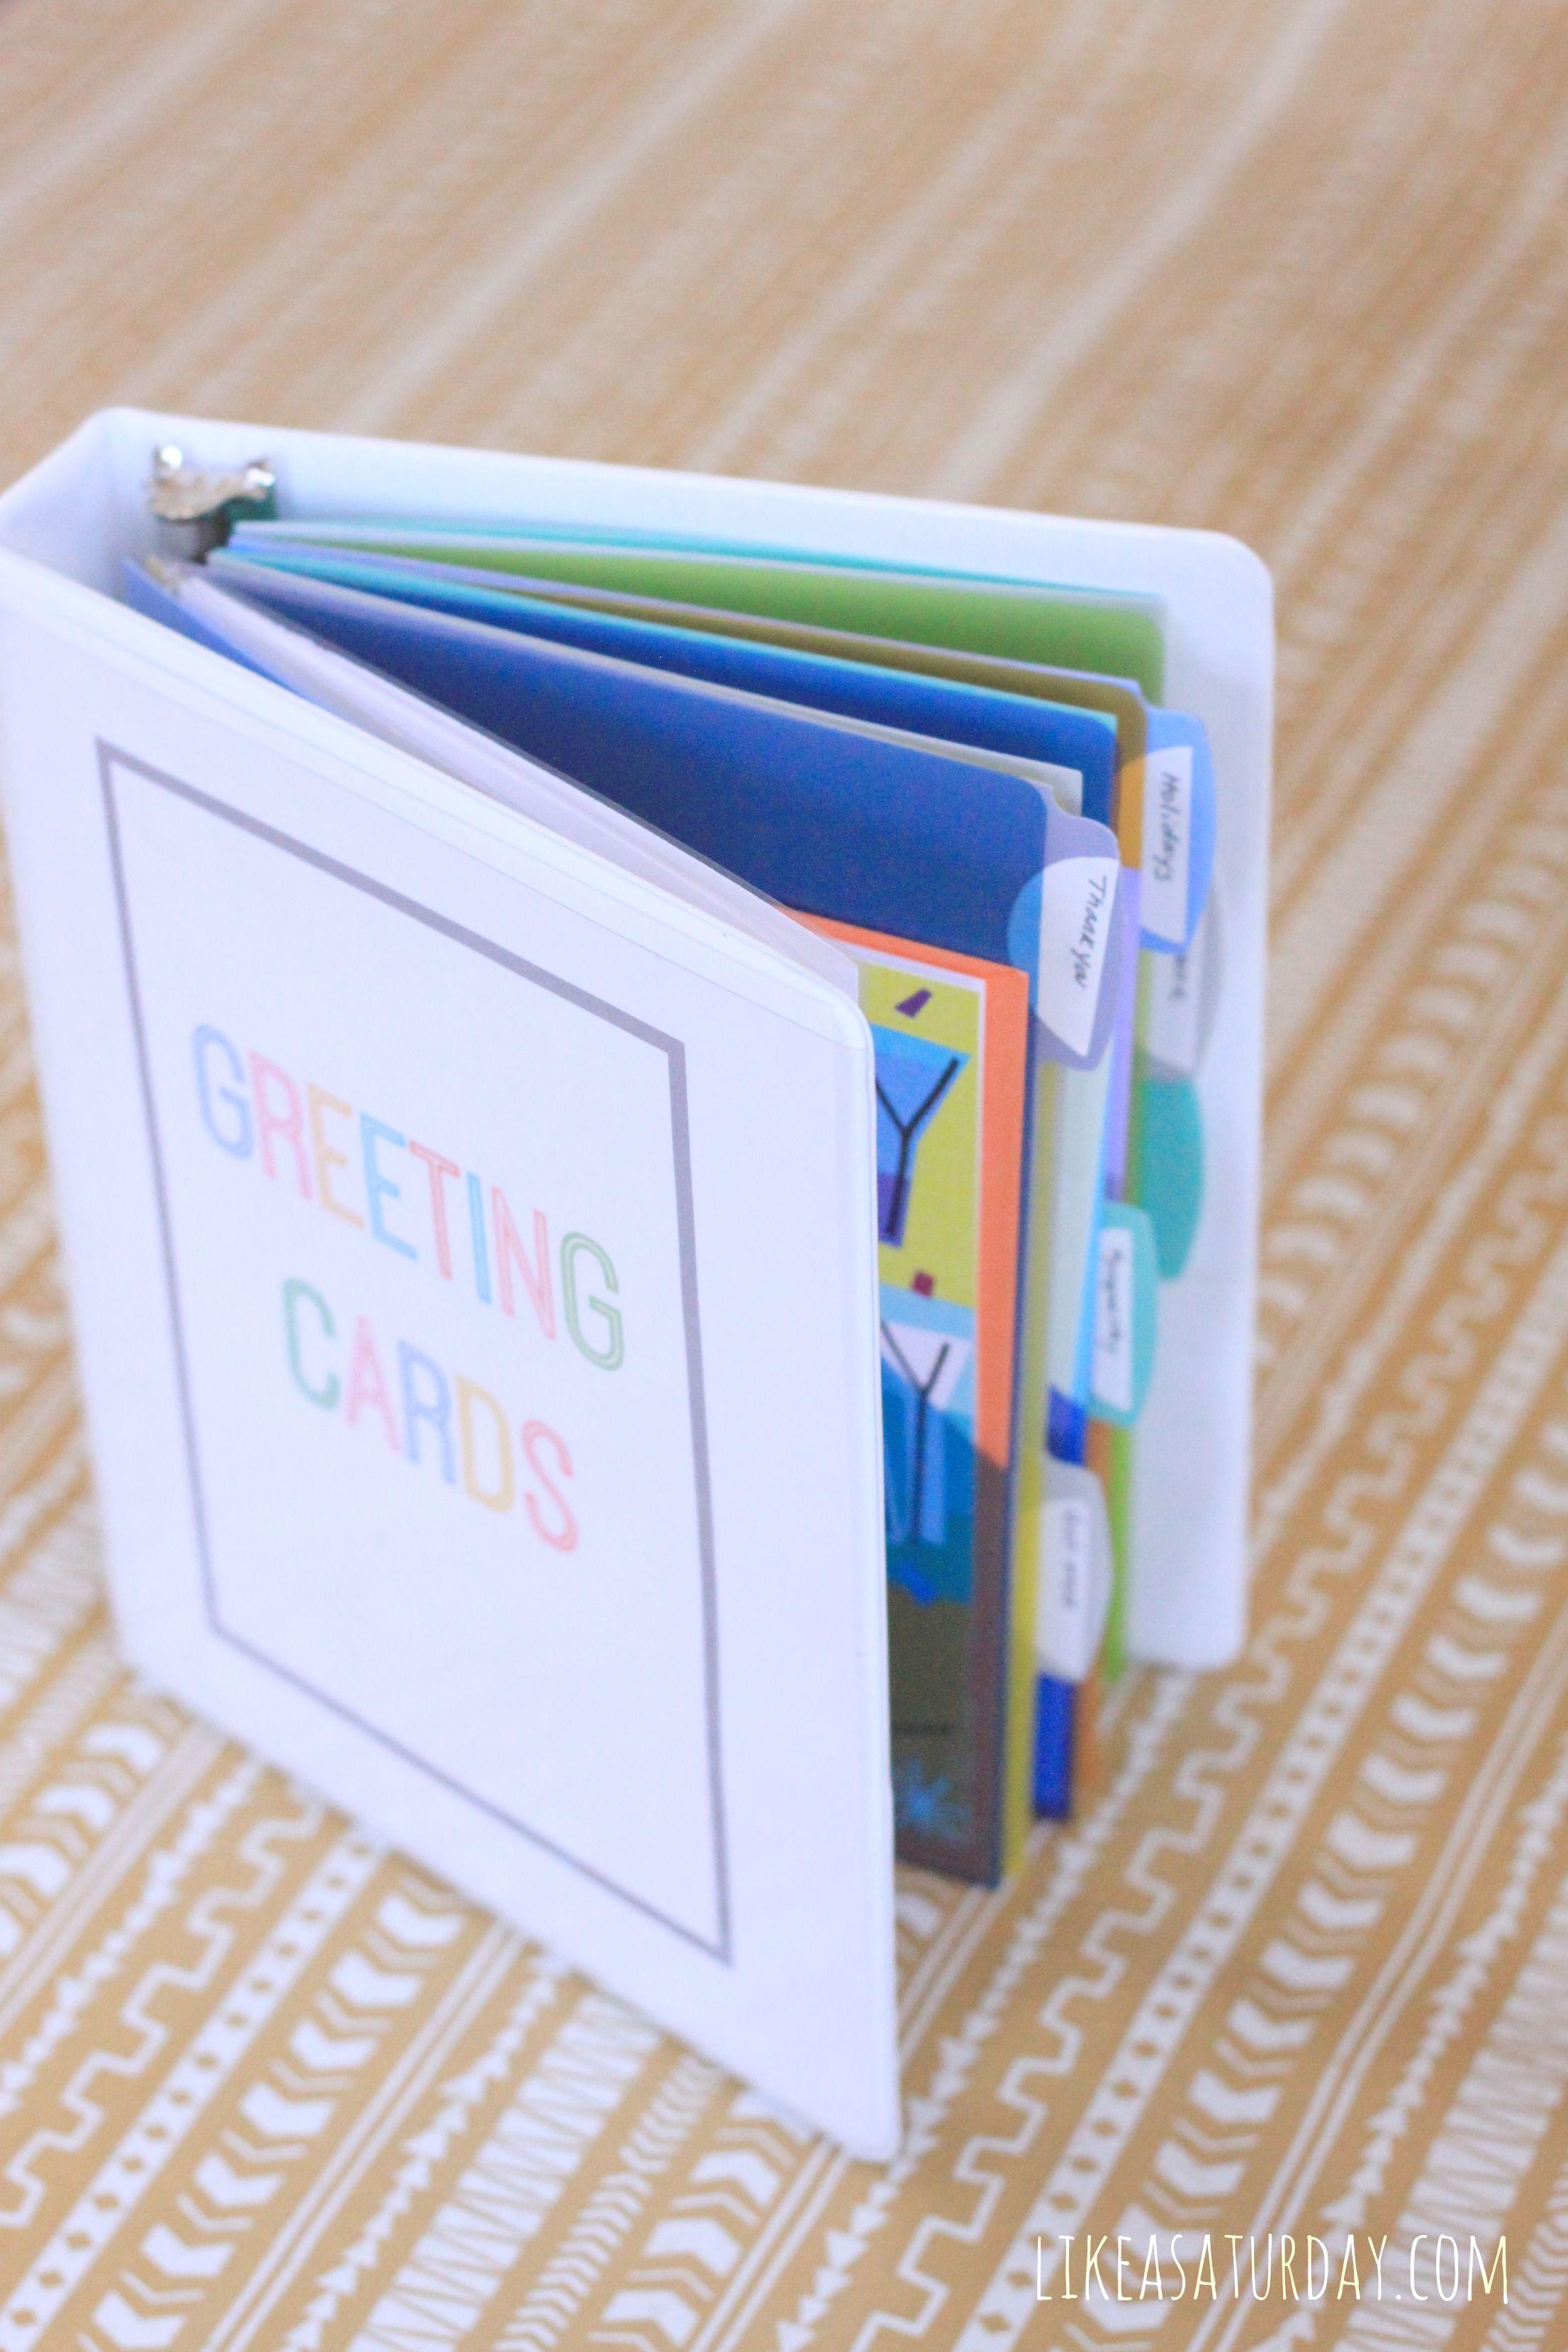 Card Binder 9g 2 212 3 318 Pixels Organisation Pinterest